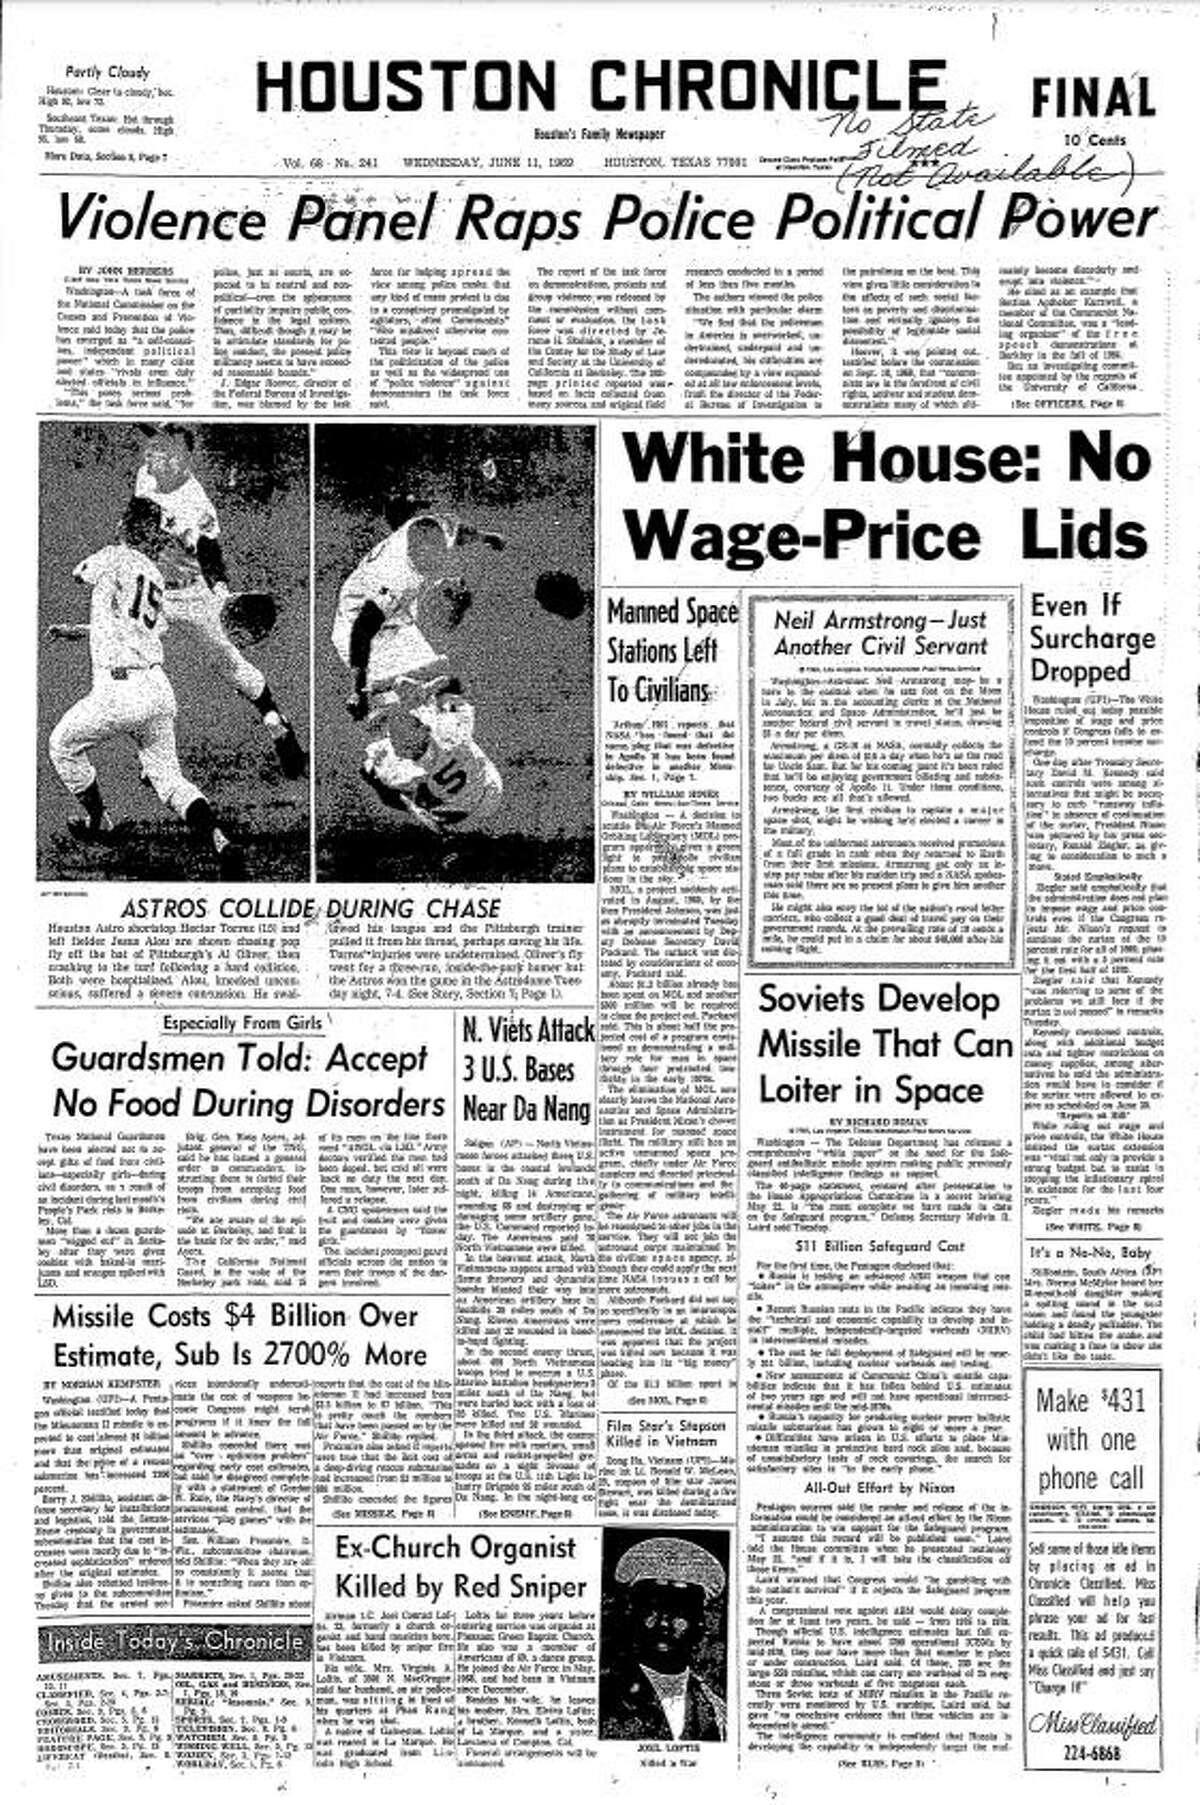 June 11, 1969